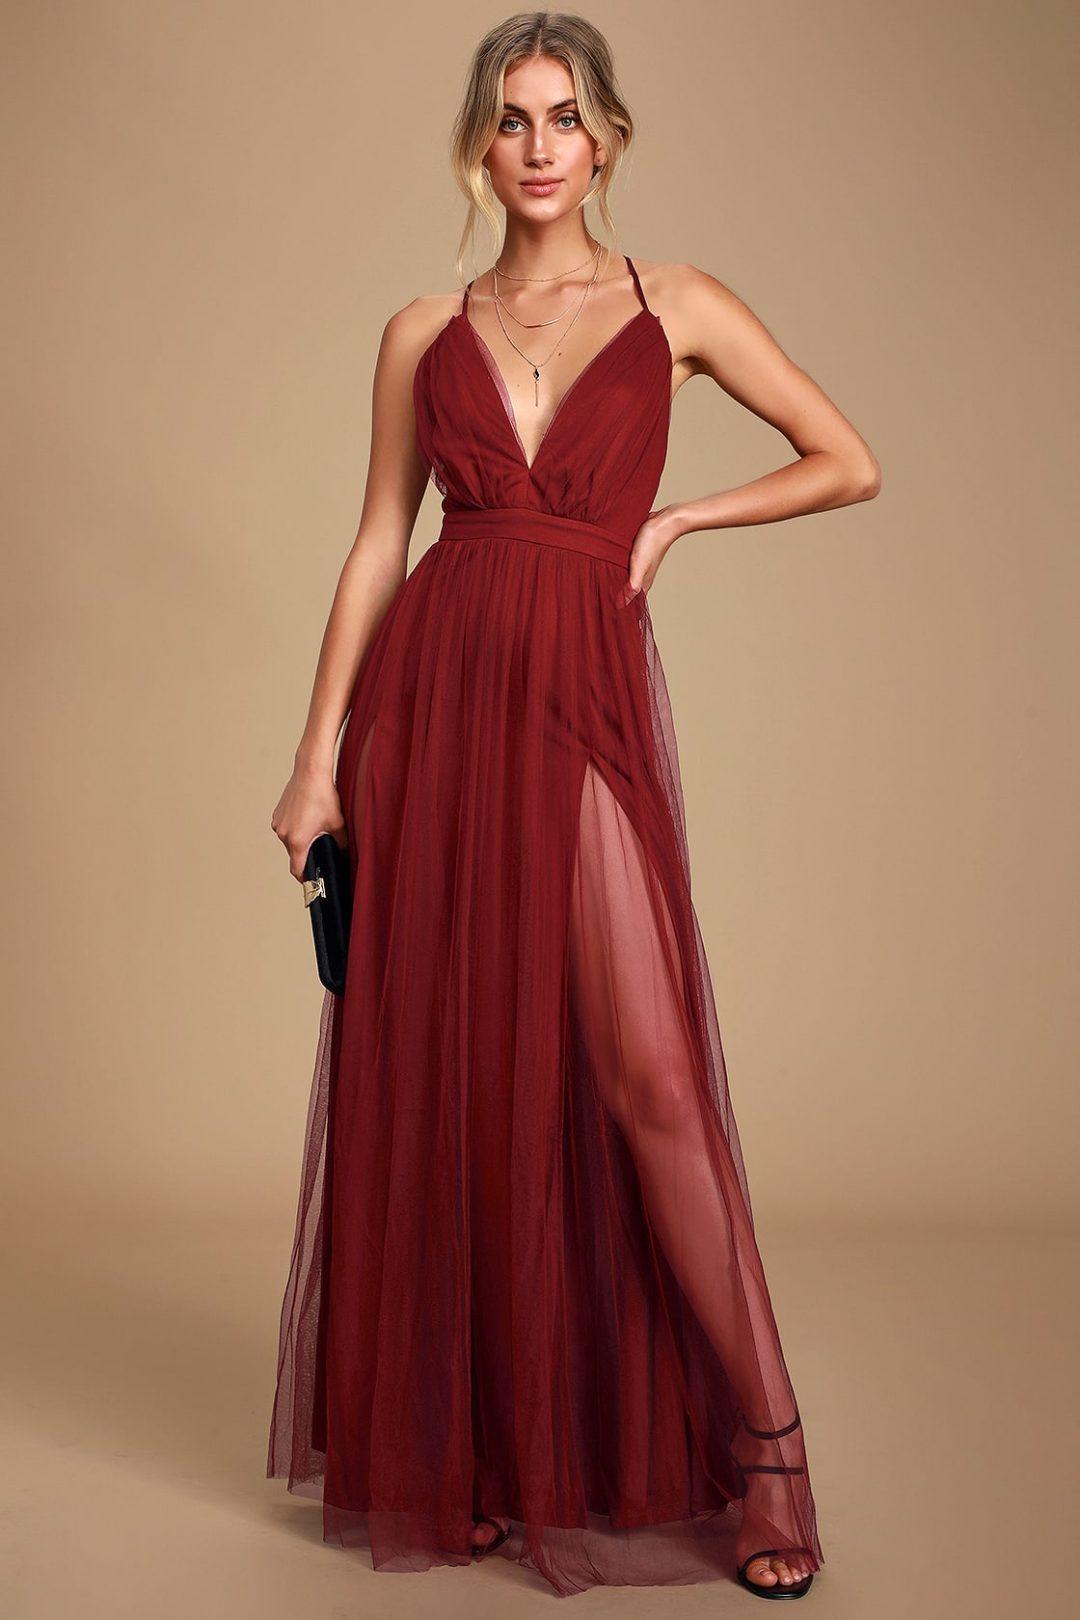 Burgundy long prom dress with thigh split